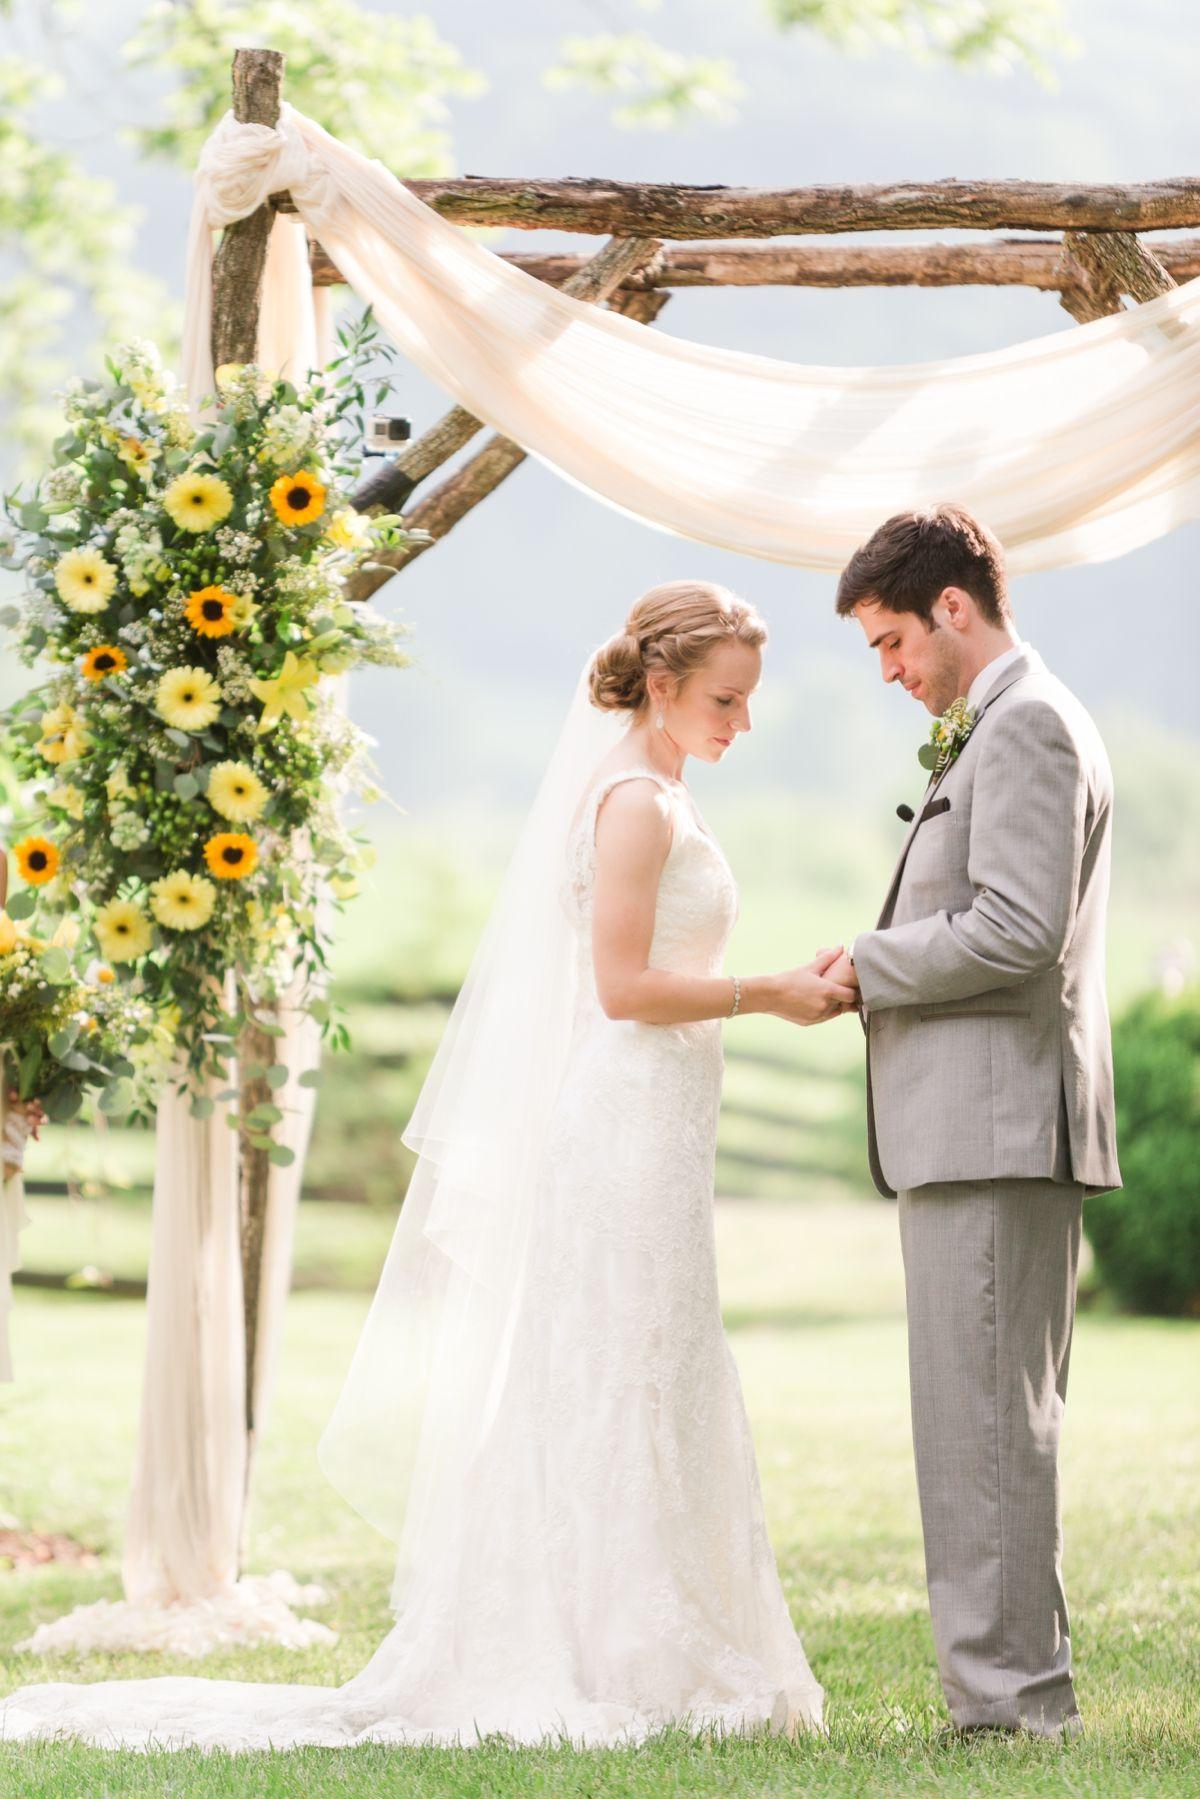 A Summer Sundara Wedding In Boones Mill Virginia Virginia Wedding Photographer Katelyn James Photography Outside Wedding Wedding Arbors Wedding Venues